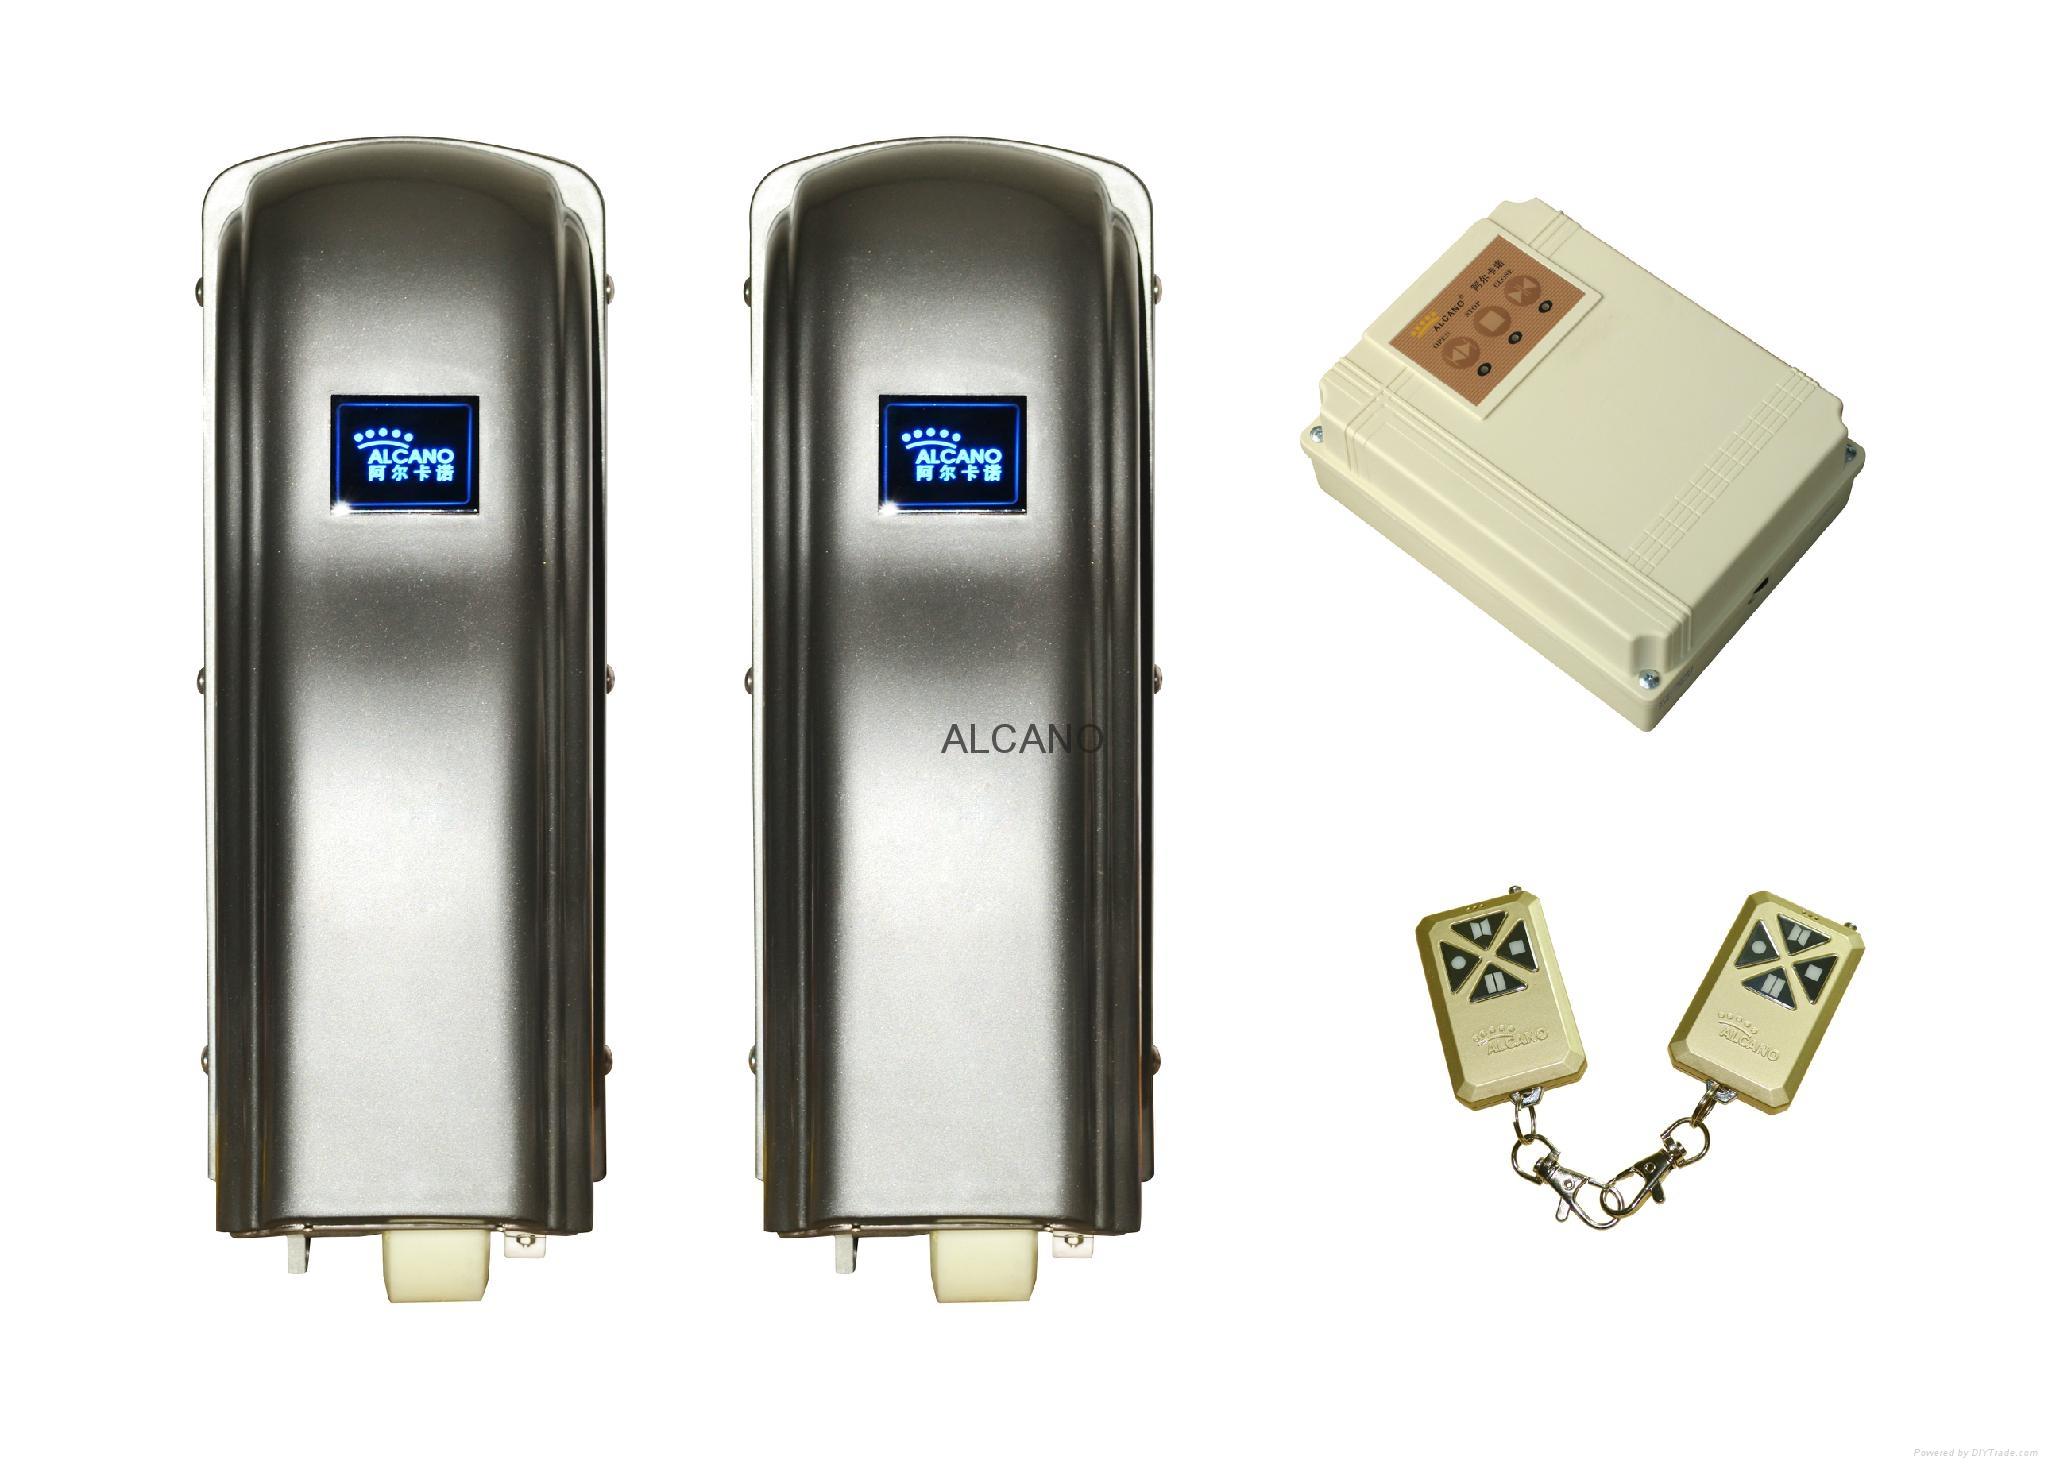 Alcano villa gate opener manufacturer 5